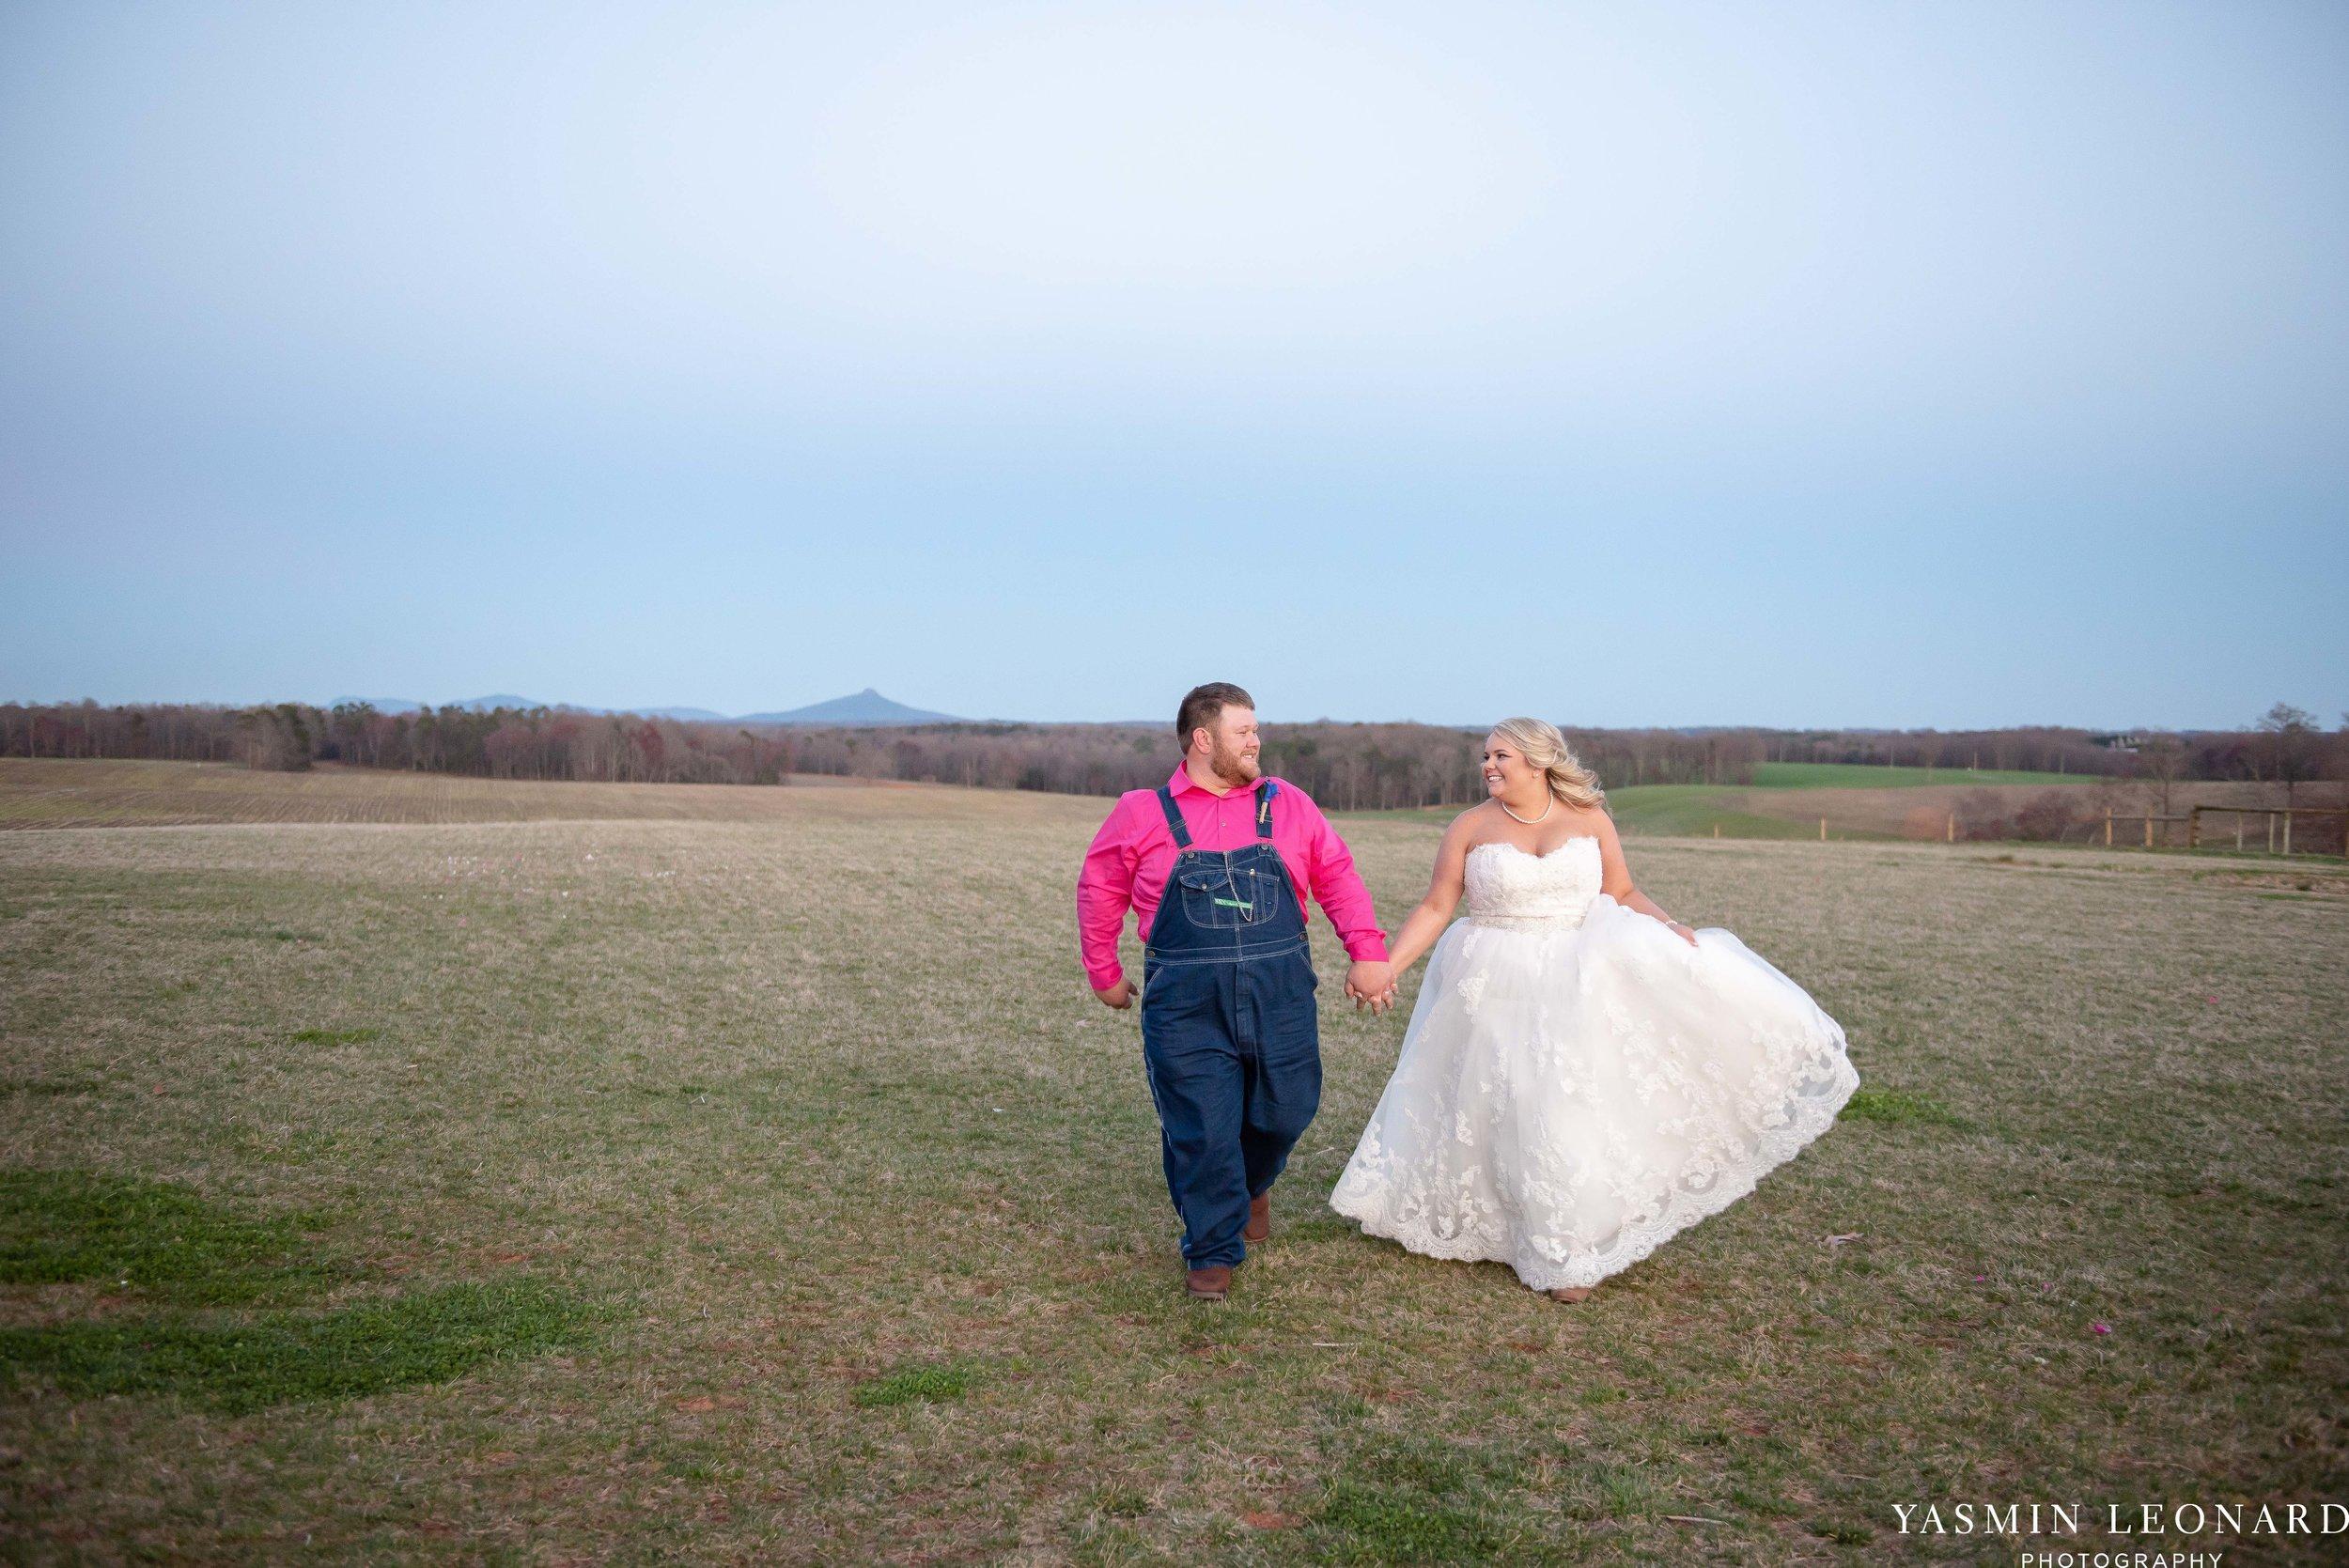 The Barn at Heritage Farm - Country Wedding - Pink and Blue Wedding - Barn Wedding - Outdoor Wedding - Cotton and Wheat Decor - Groom in Bibs - Pink Bridal Colors - Yasmin Leonard Photography-29.jpg